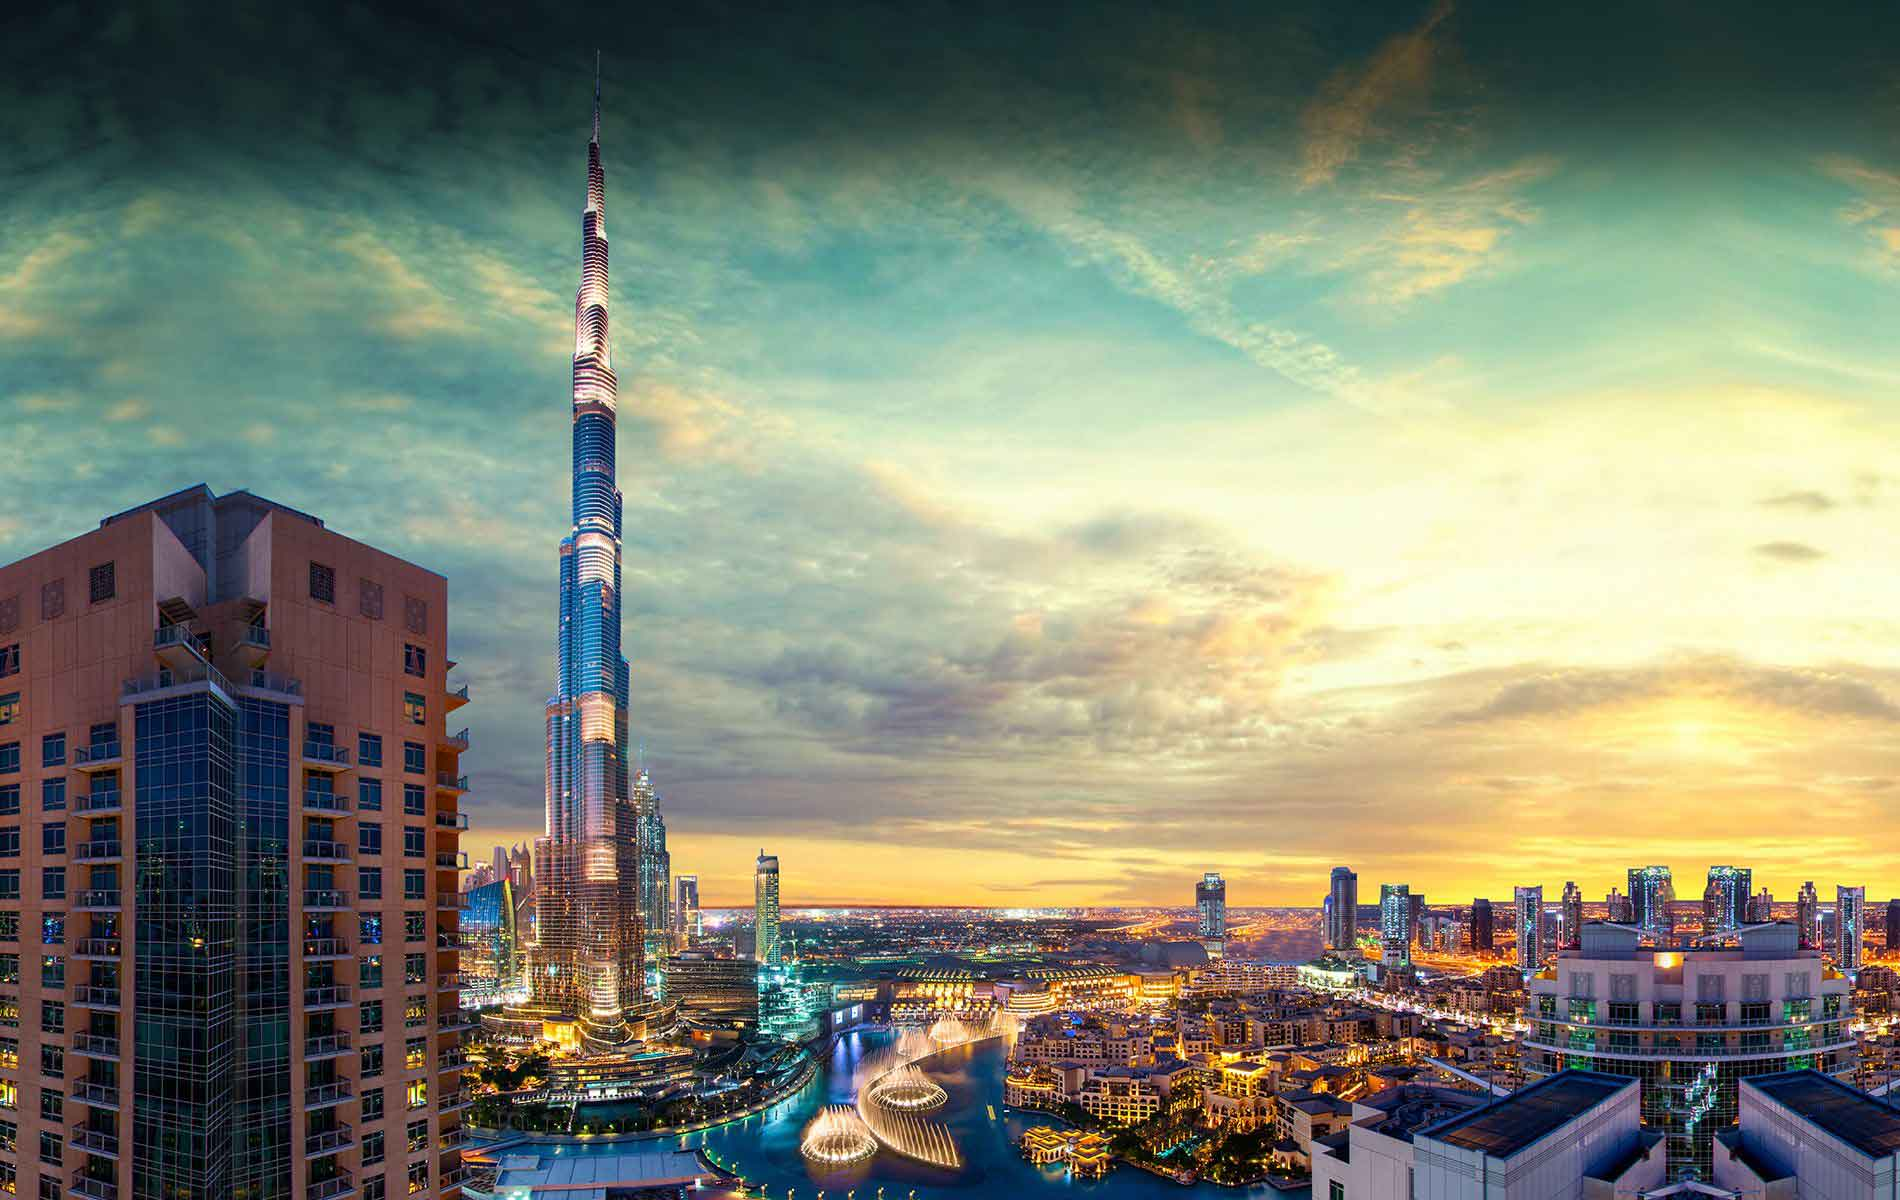 استقبال دبي 15 مليون زائر دولي خلال عام 2019